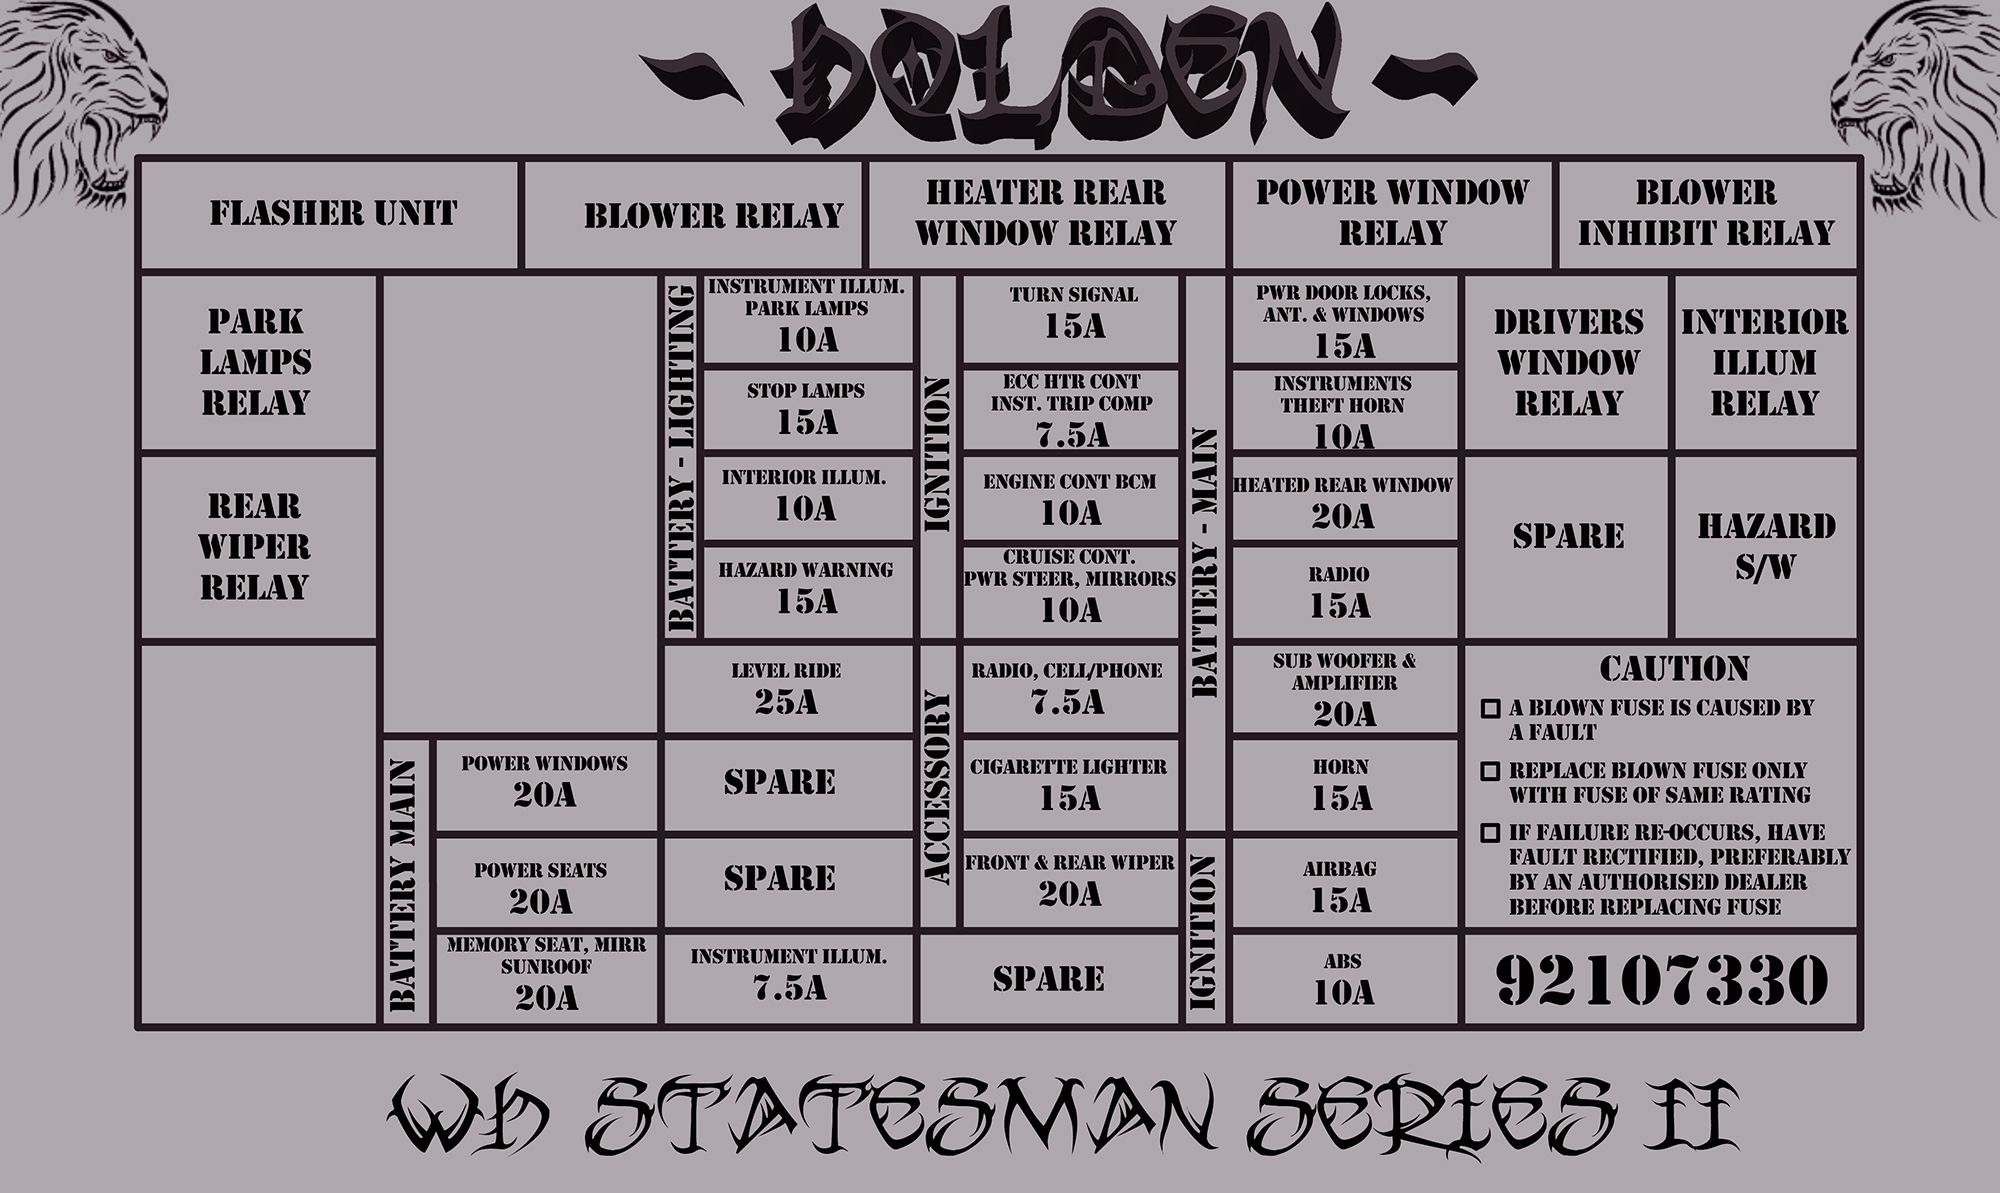 Wh Statesman Series Ii Fuse Relay Diagram